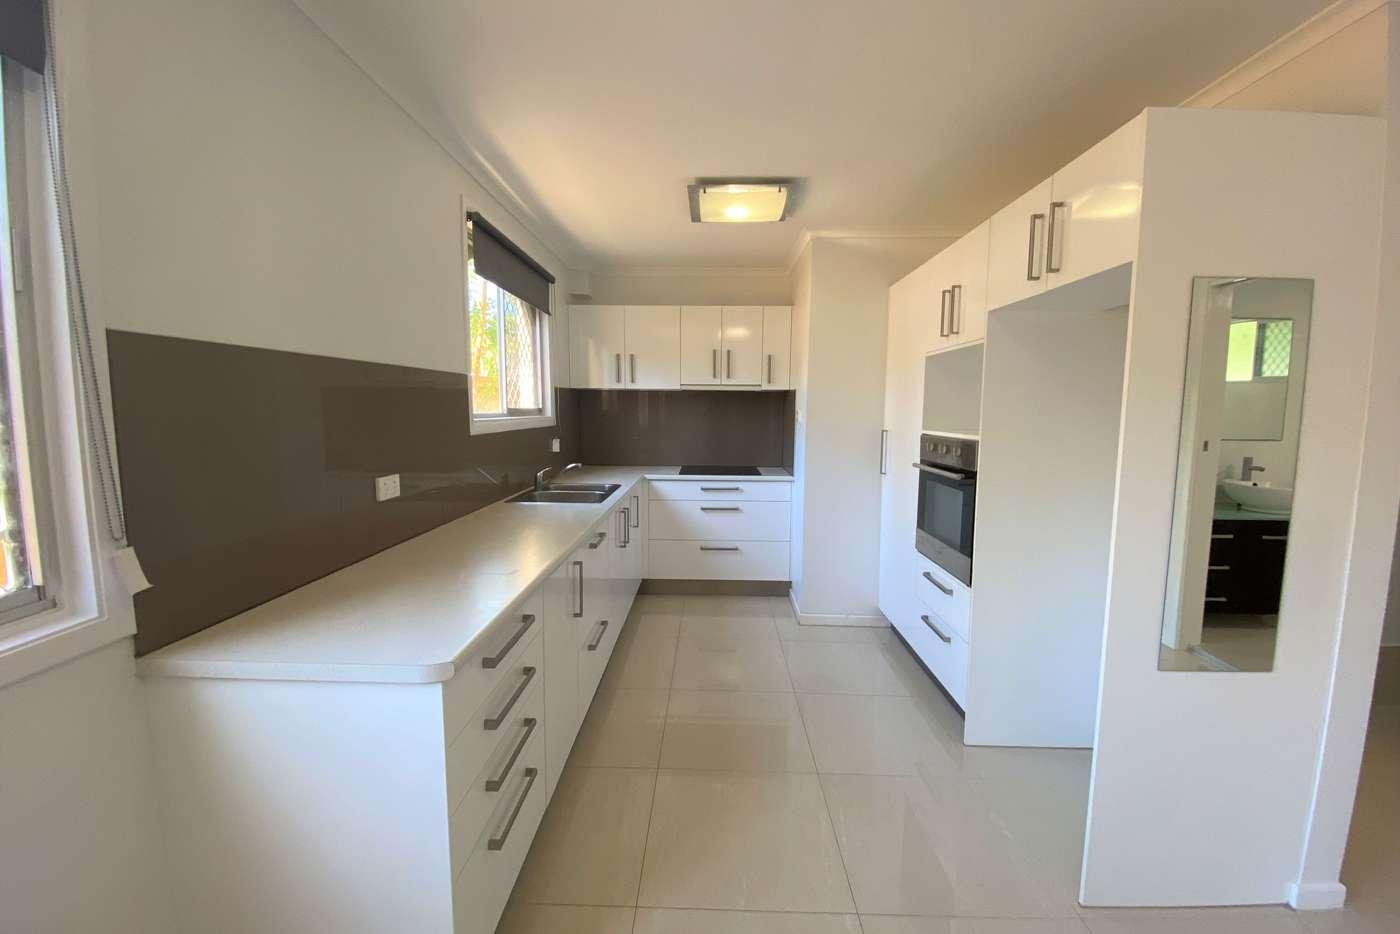 Main view of Homely unit listing, 1/4 Sunbrite Avenue, Mermaid Beach QLD 4218